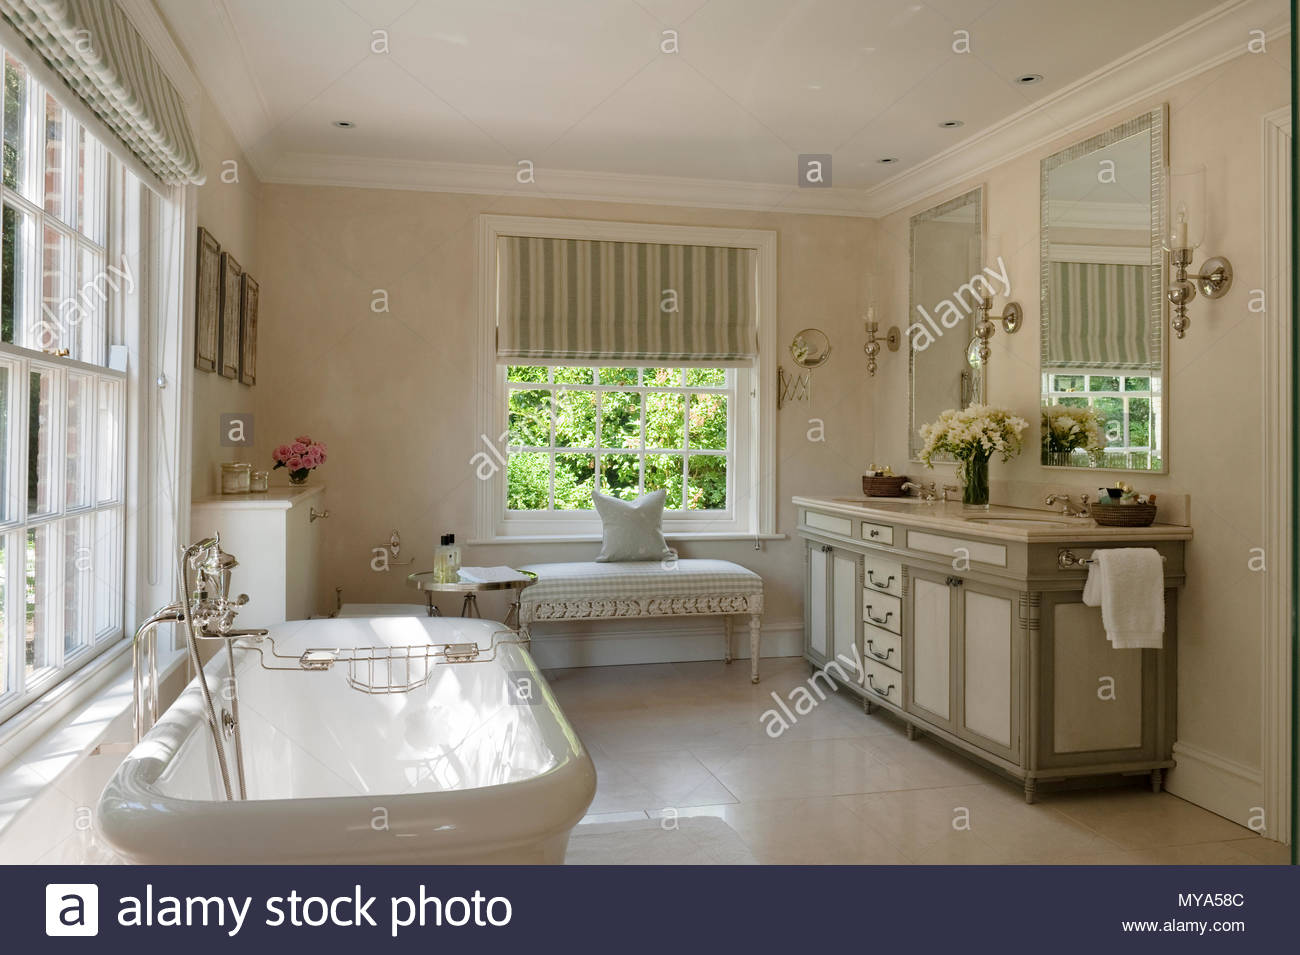 Elegante cuarto de baño Foto & Imagen De Stock: 188923068 - Alamy